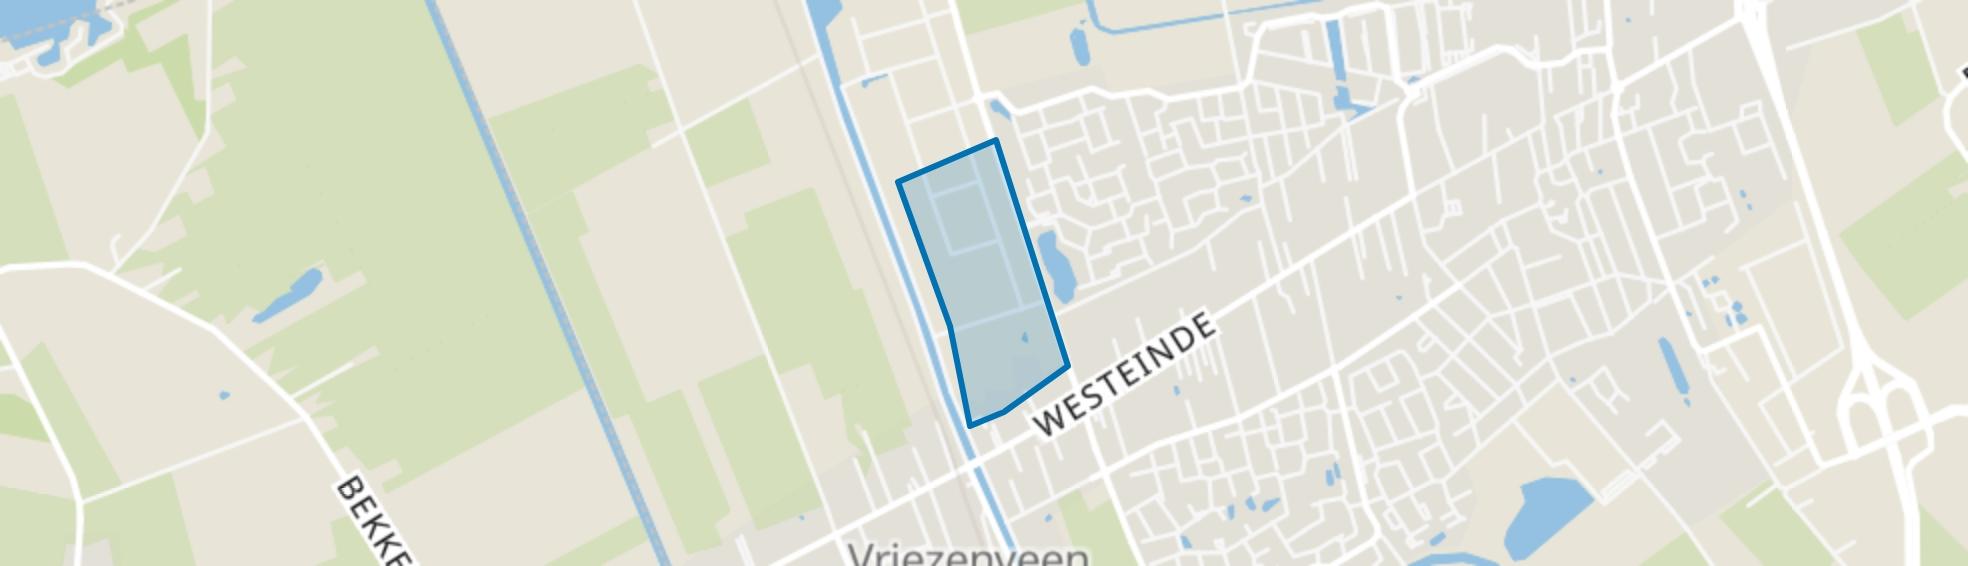 Industrieterrein Vriezenveen-West, Vriezenveen map